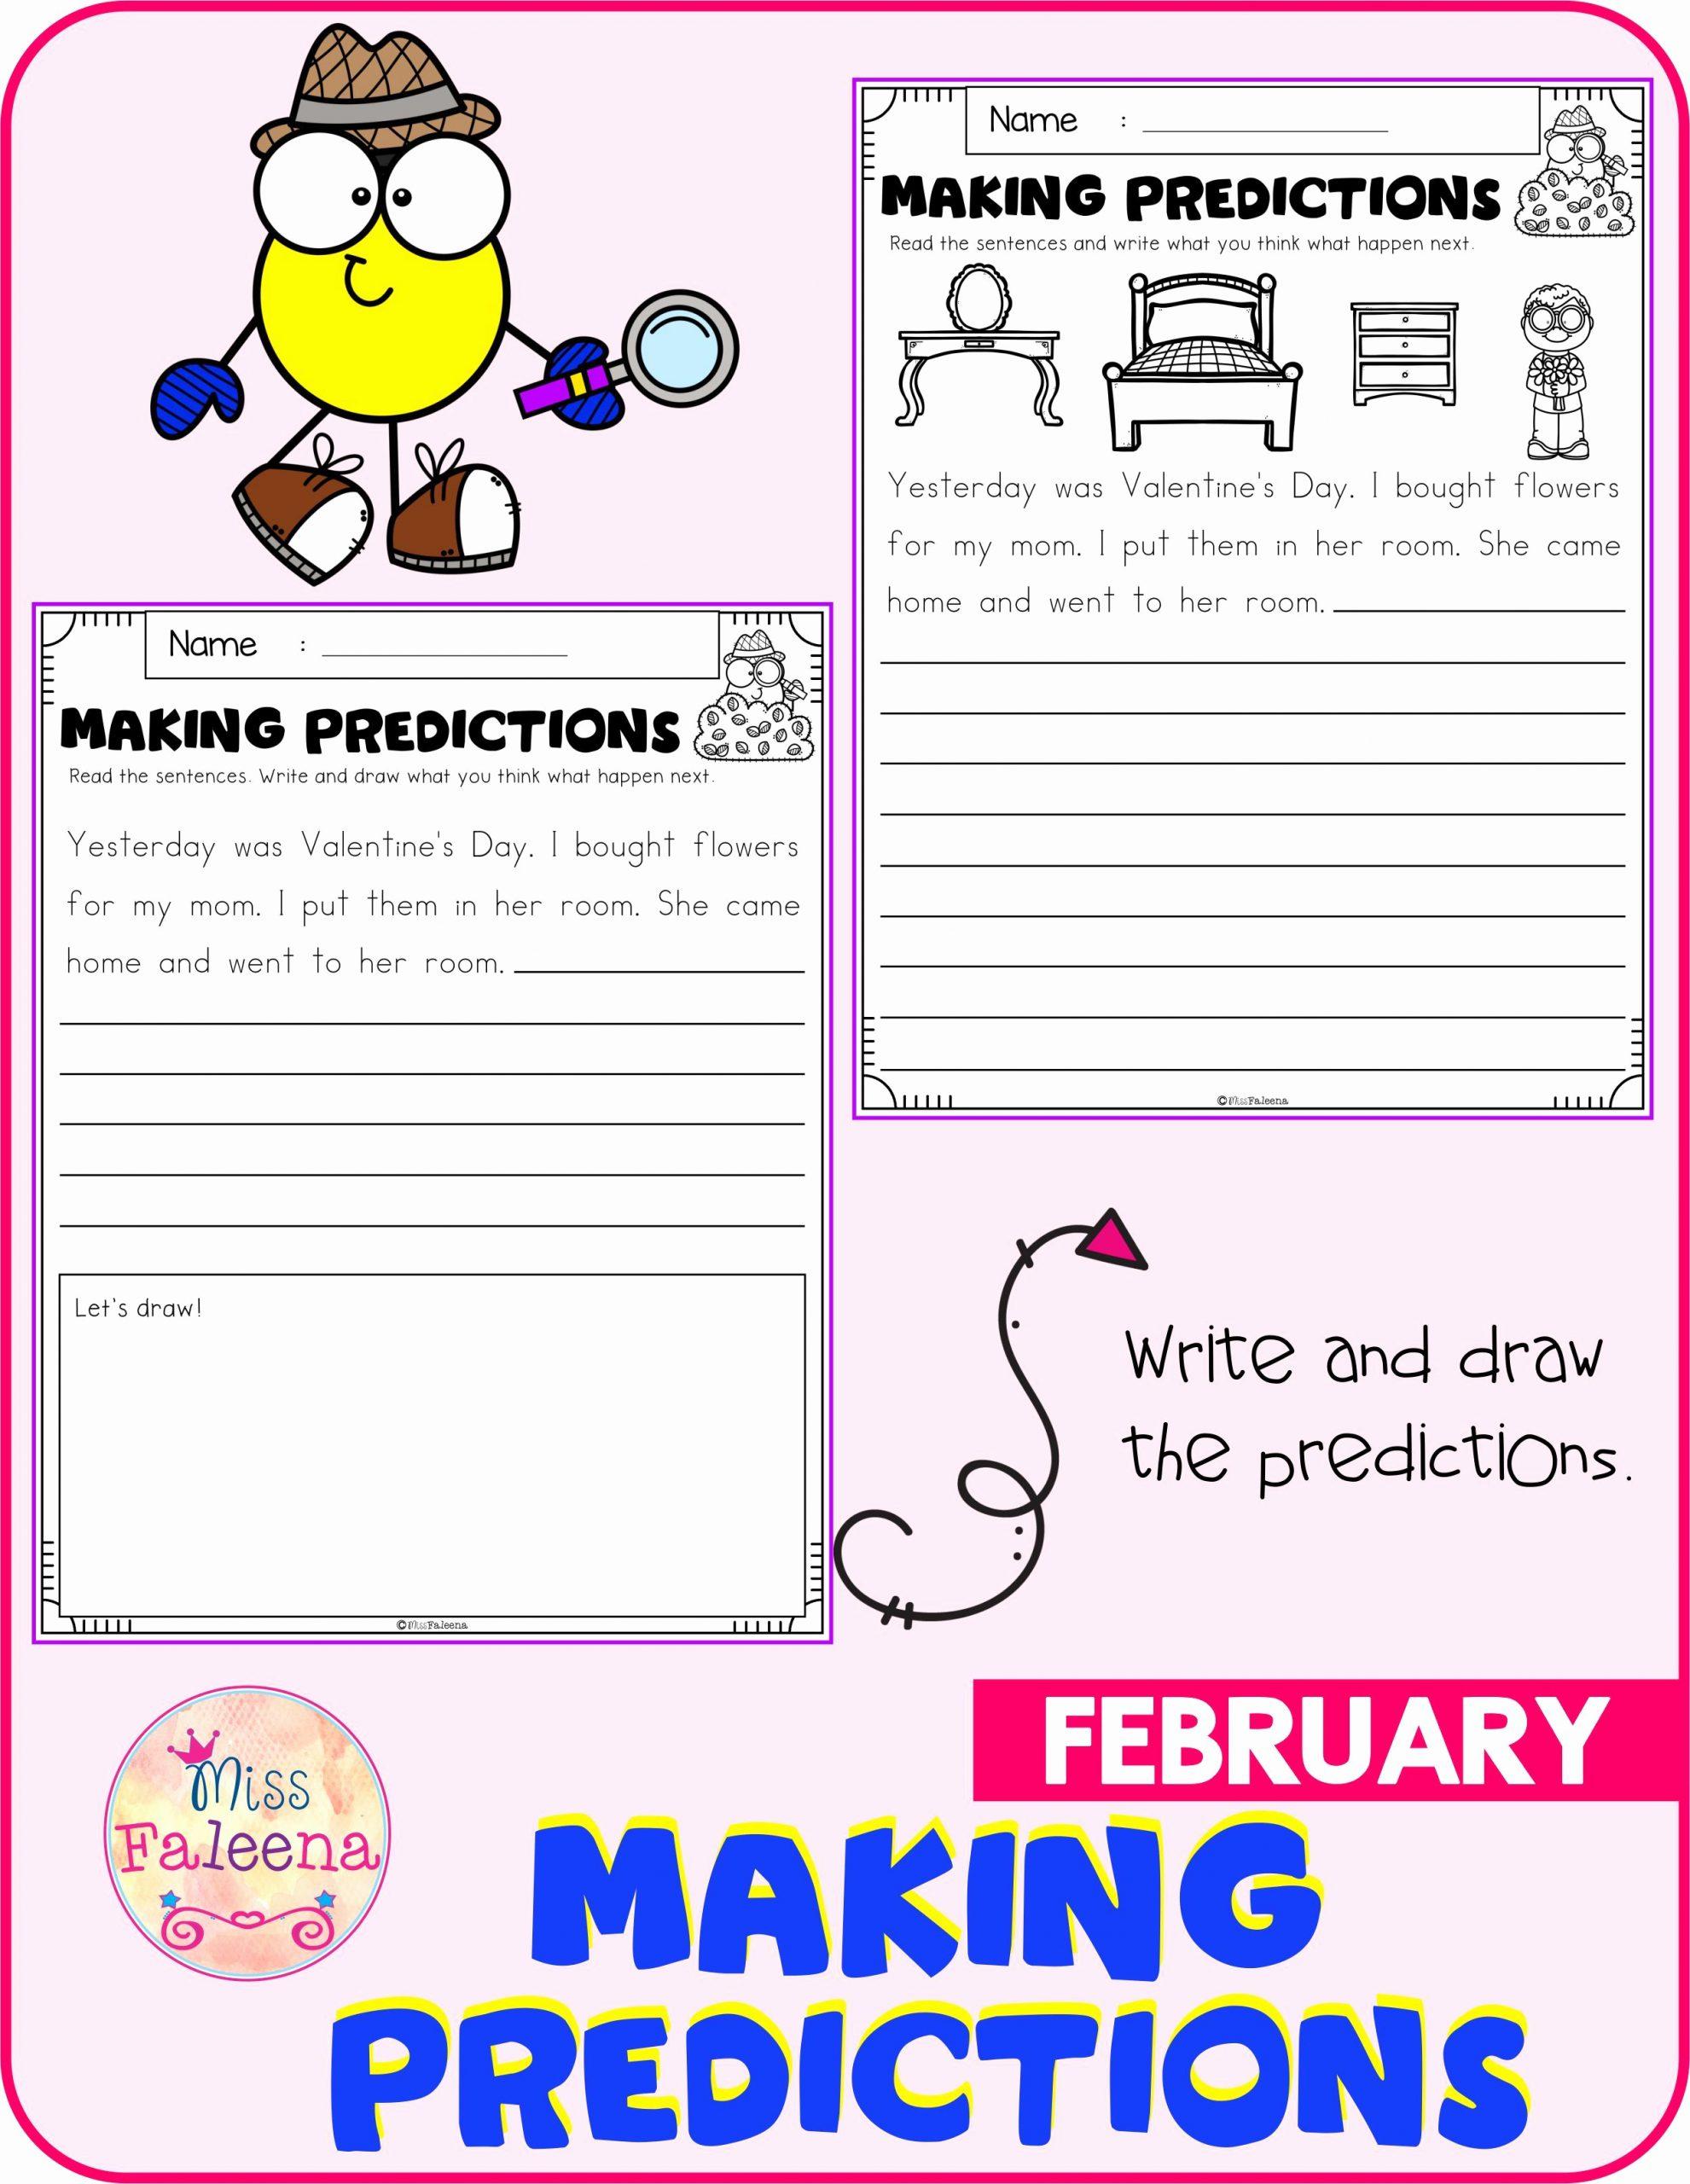 Prediction Worksheets for 3rd Grade Elegant February Making Predictions